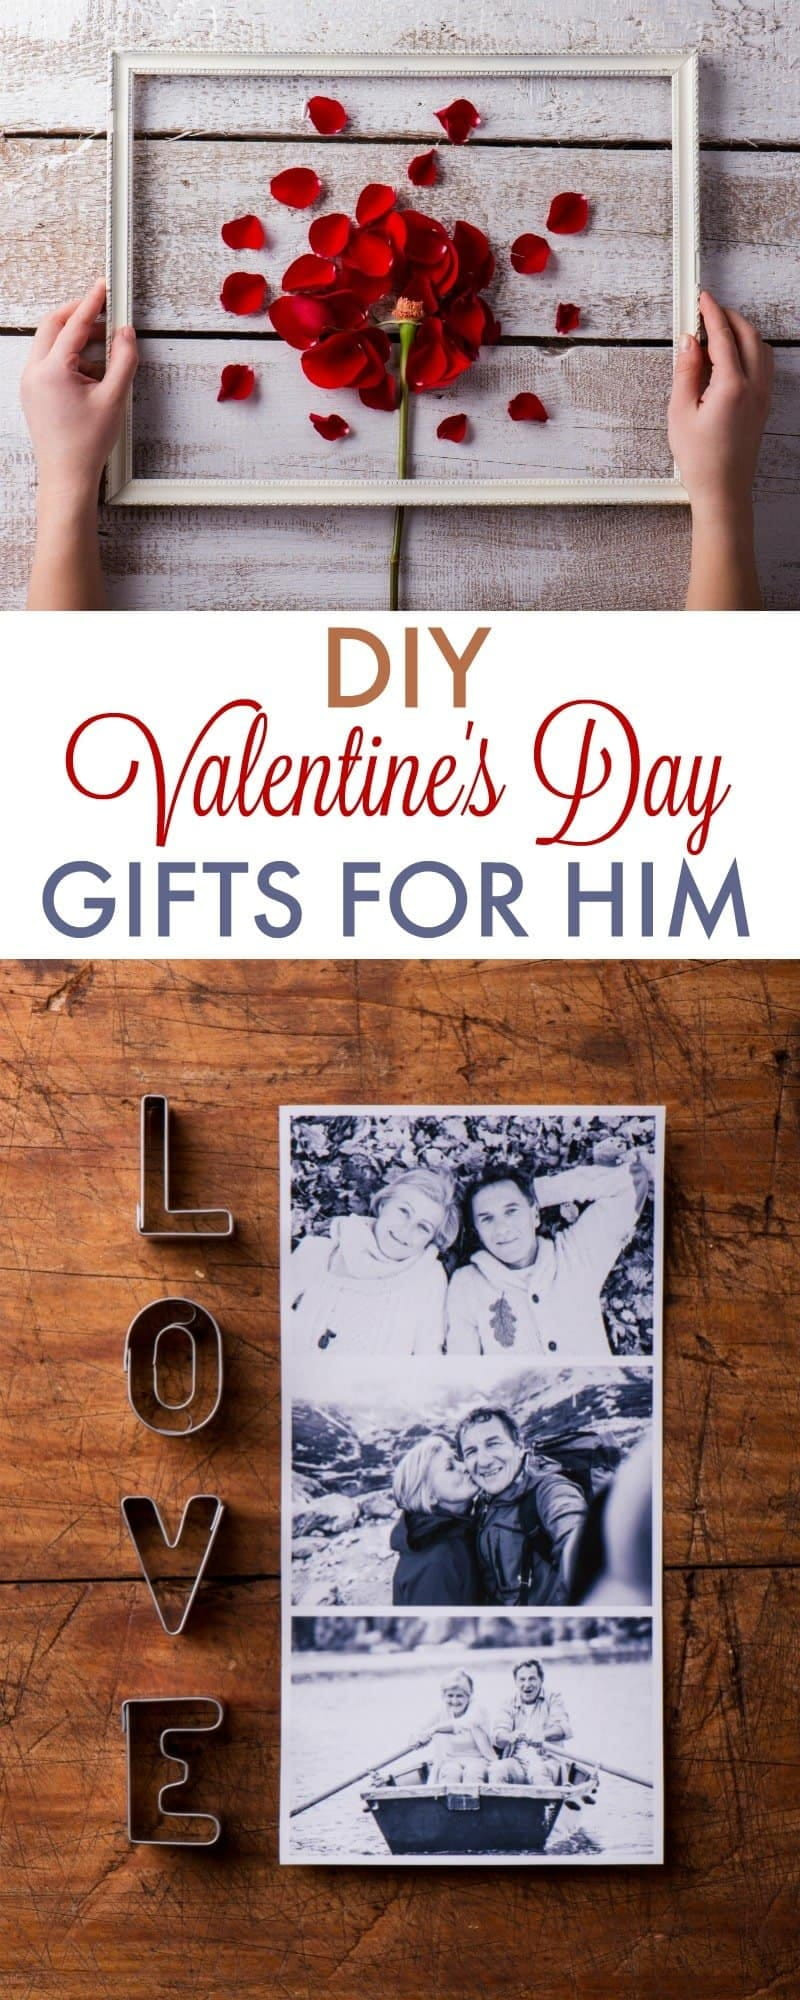 Valentines Day Gifts For Him DIY  DIY Valentine s Day Gifts for Boyfriend 730 Sage Street